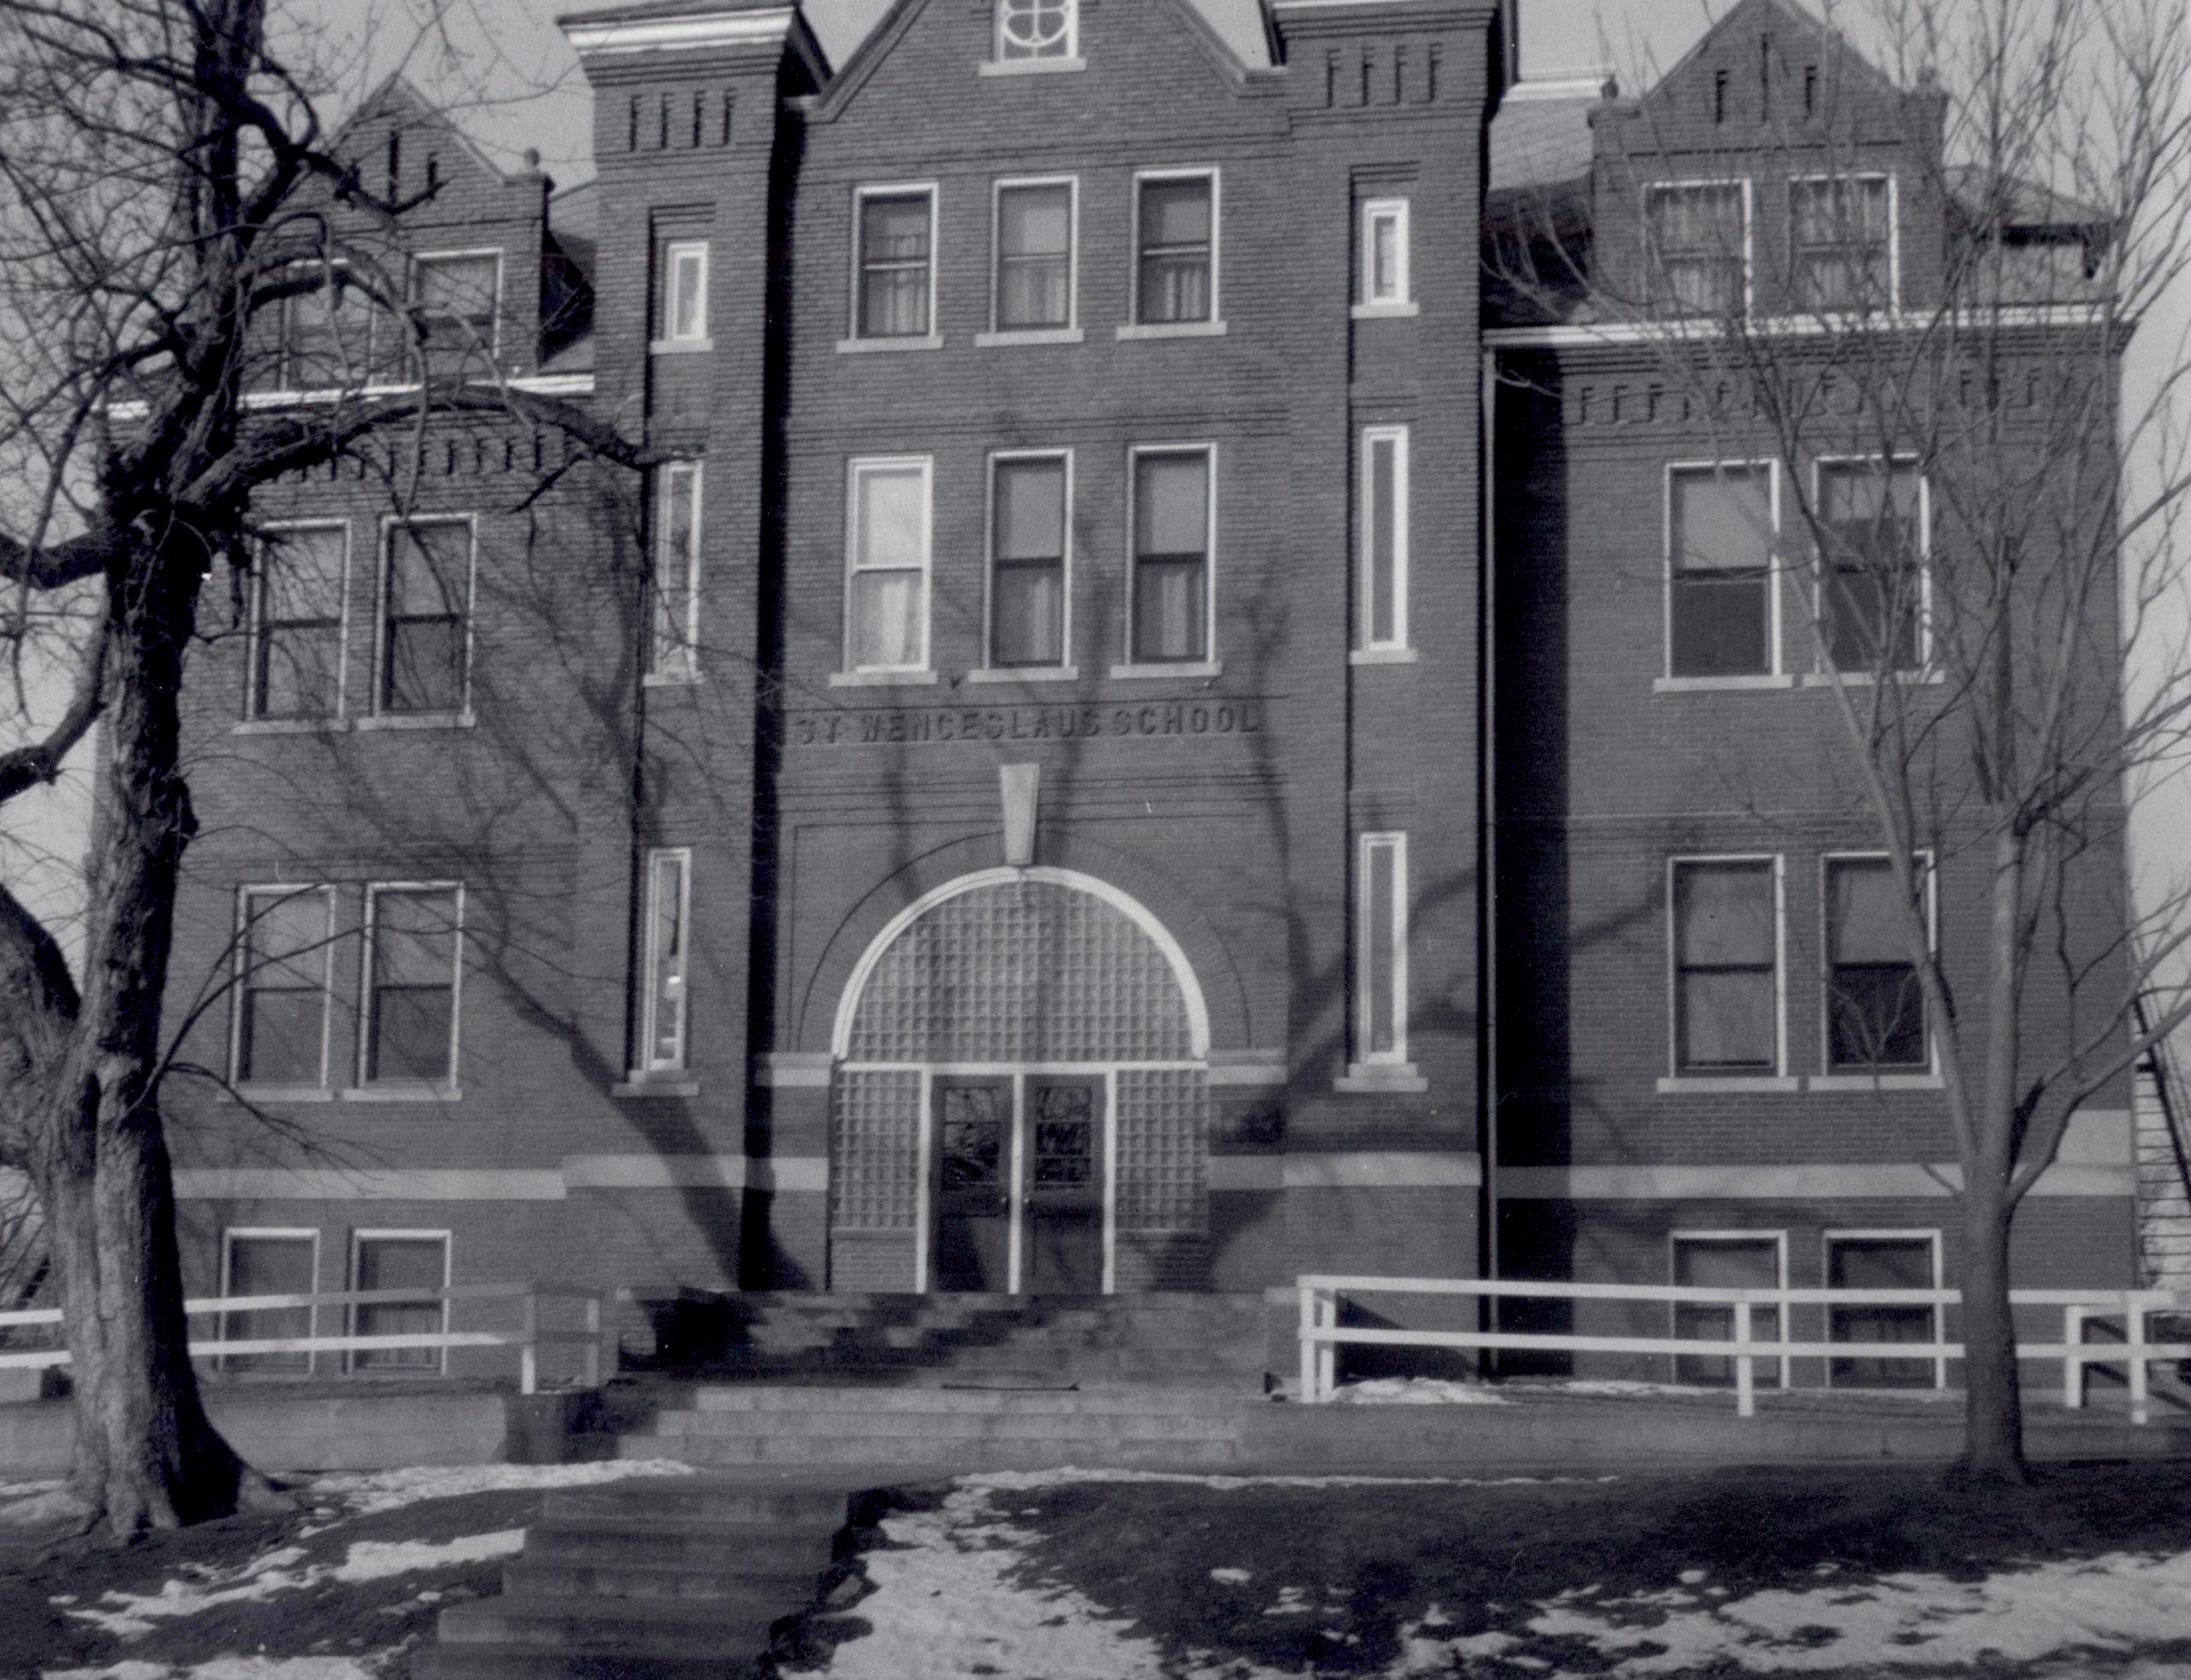 1923 saint wenceslaus school in wahoo nebraska